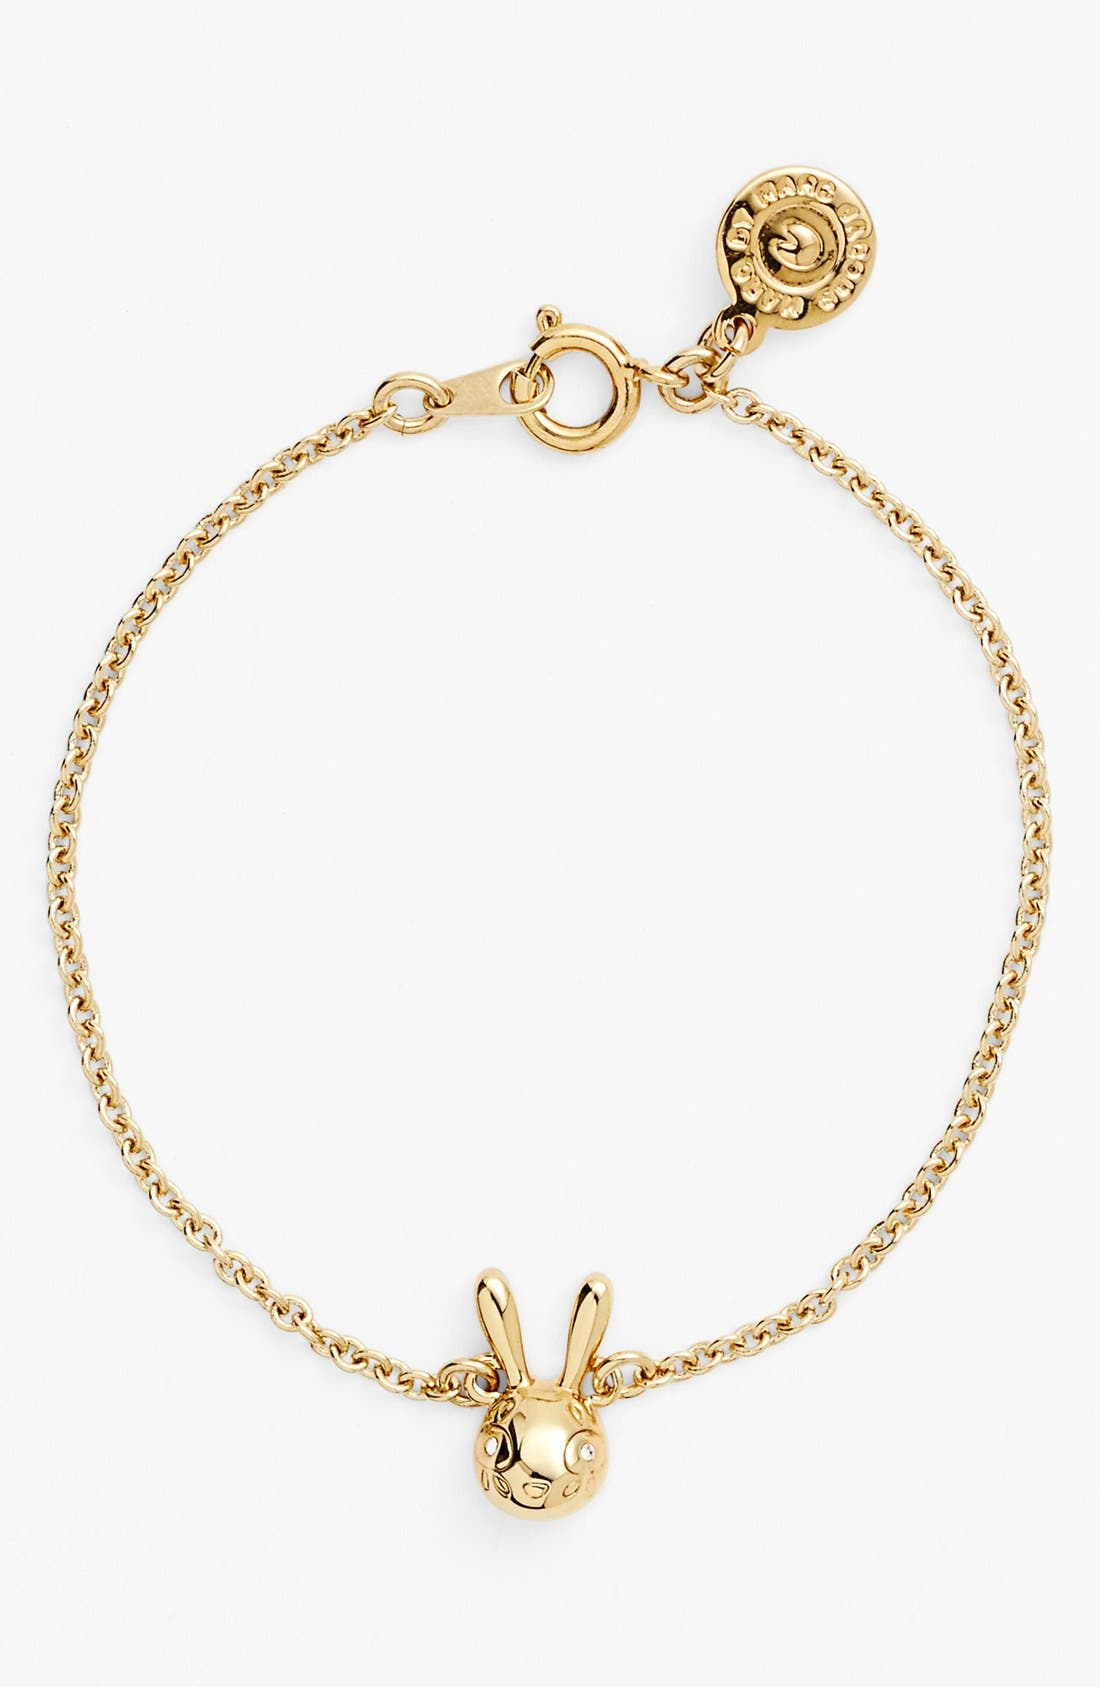 Alternate Image 1 Selected - MARC BY MARC JACOBS 'Dynamite' Bunny Line Bracelet